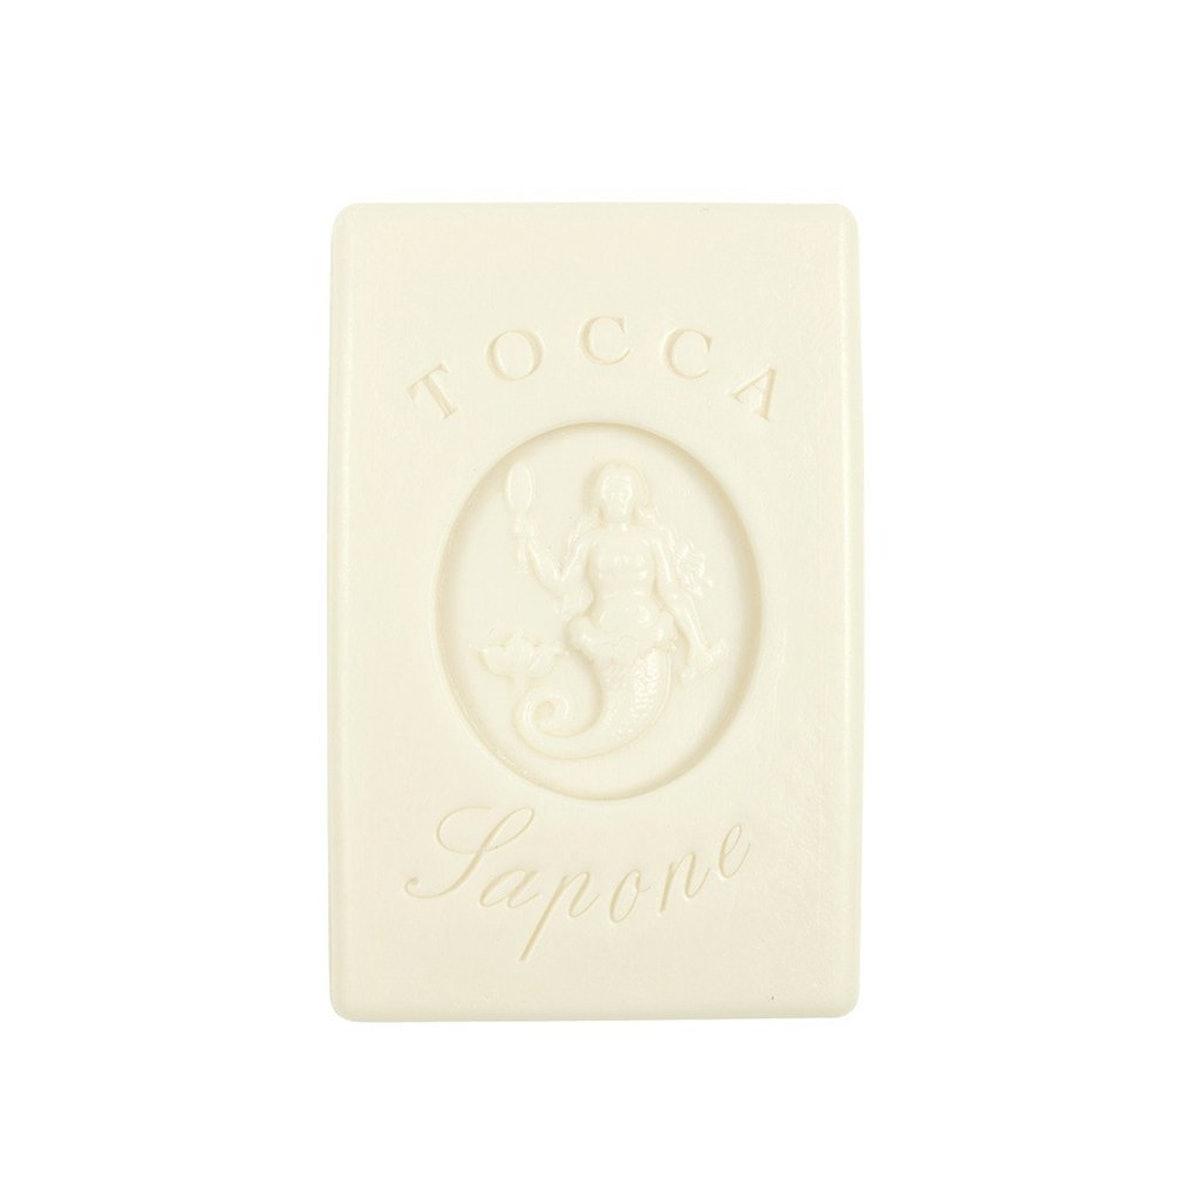 Tocca Sapone Florence Bar Soap